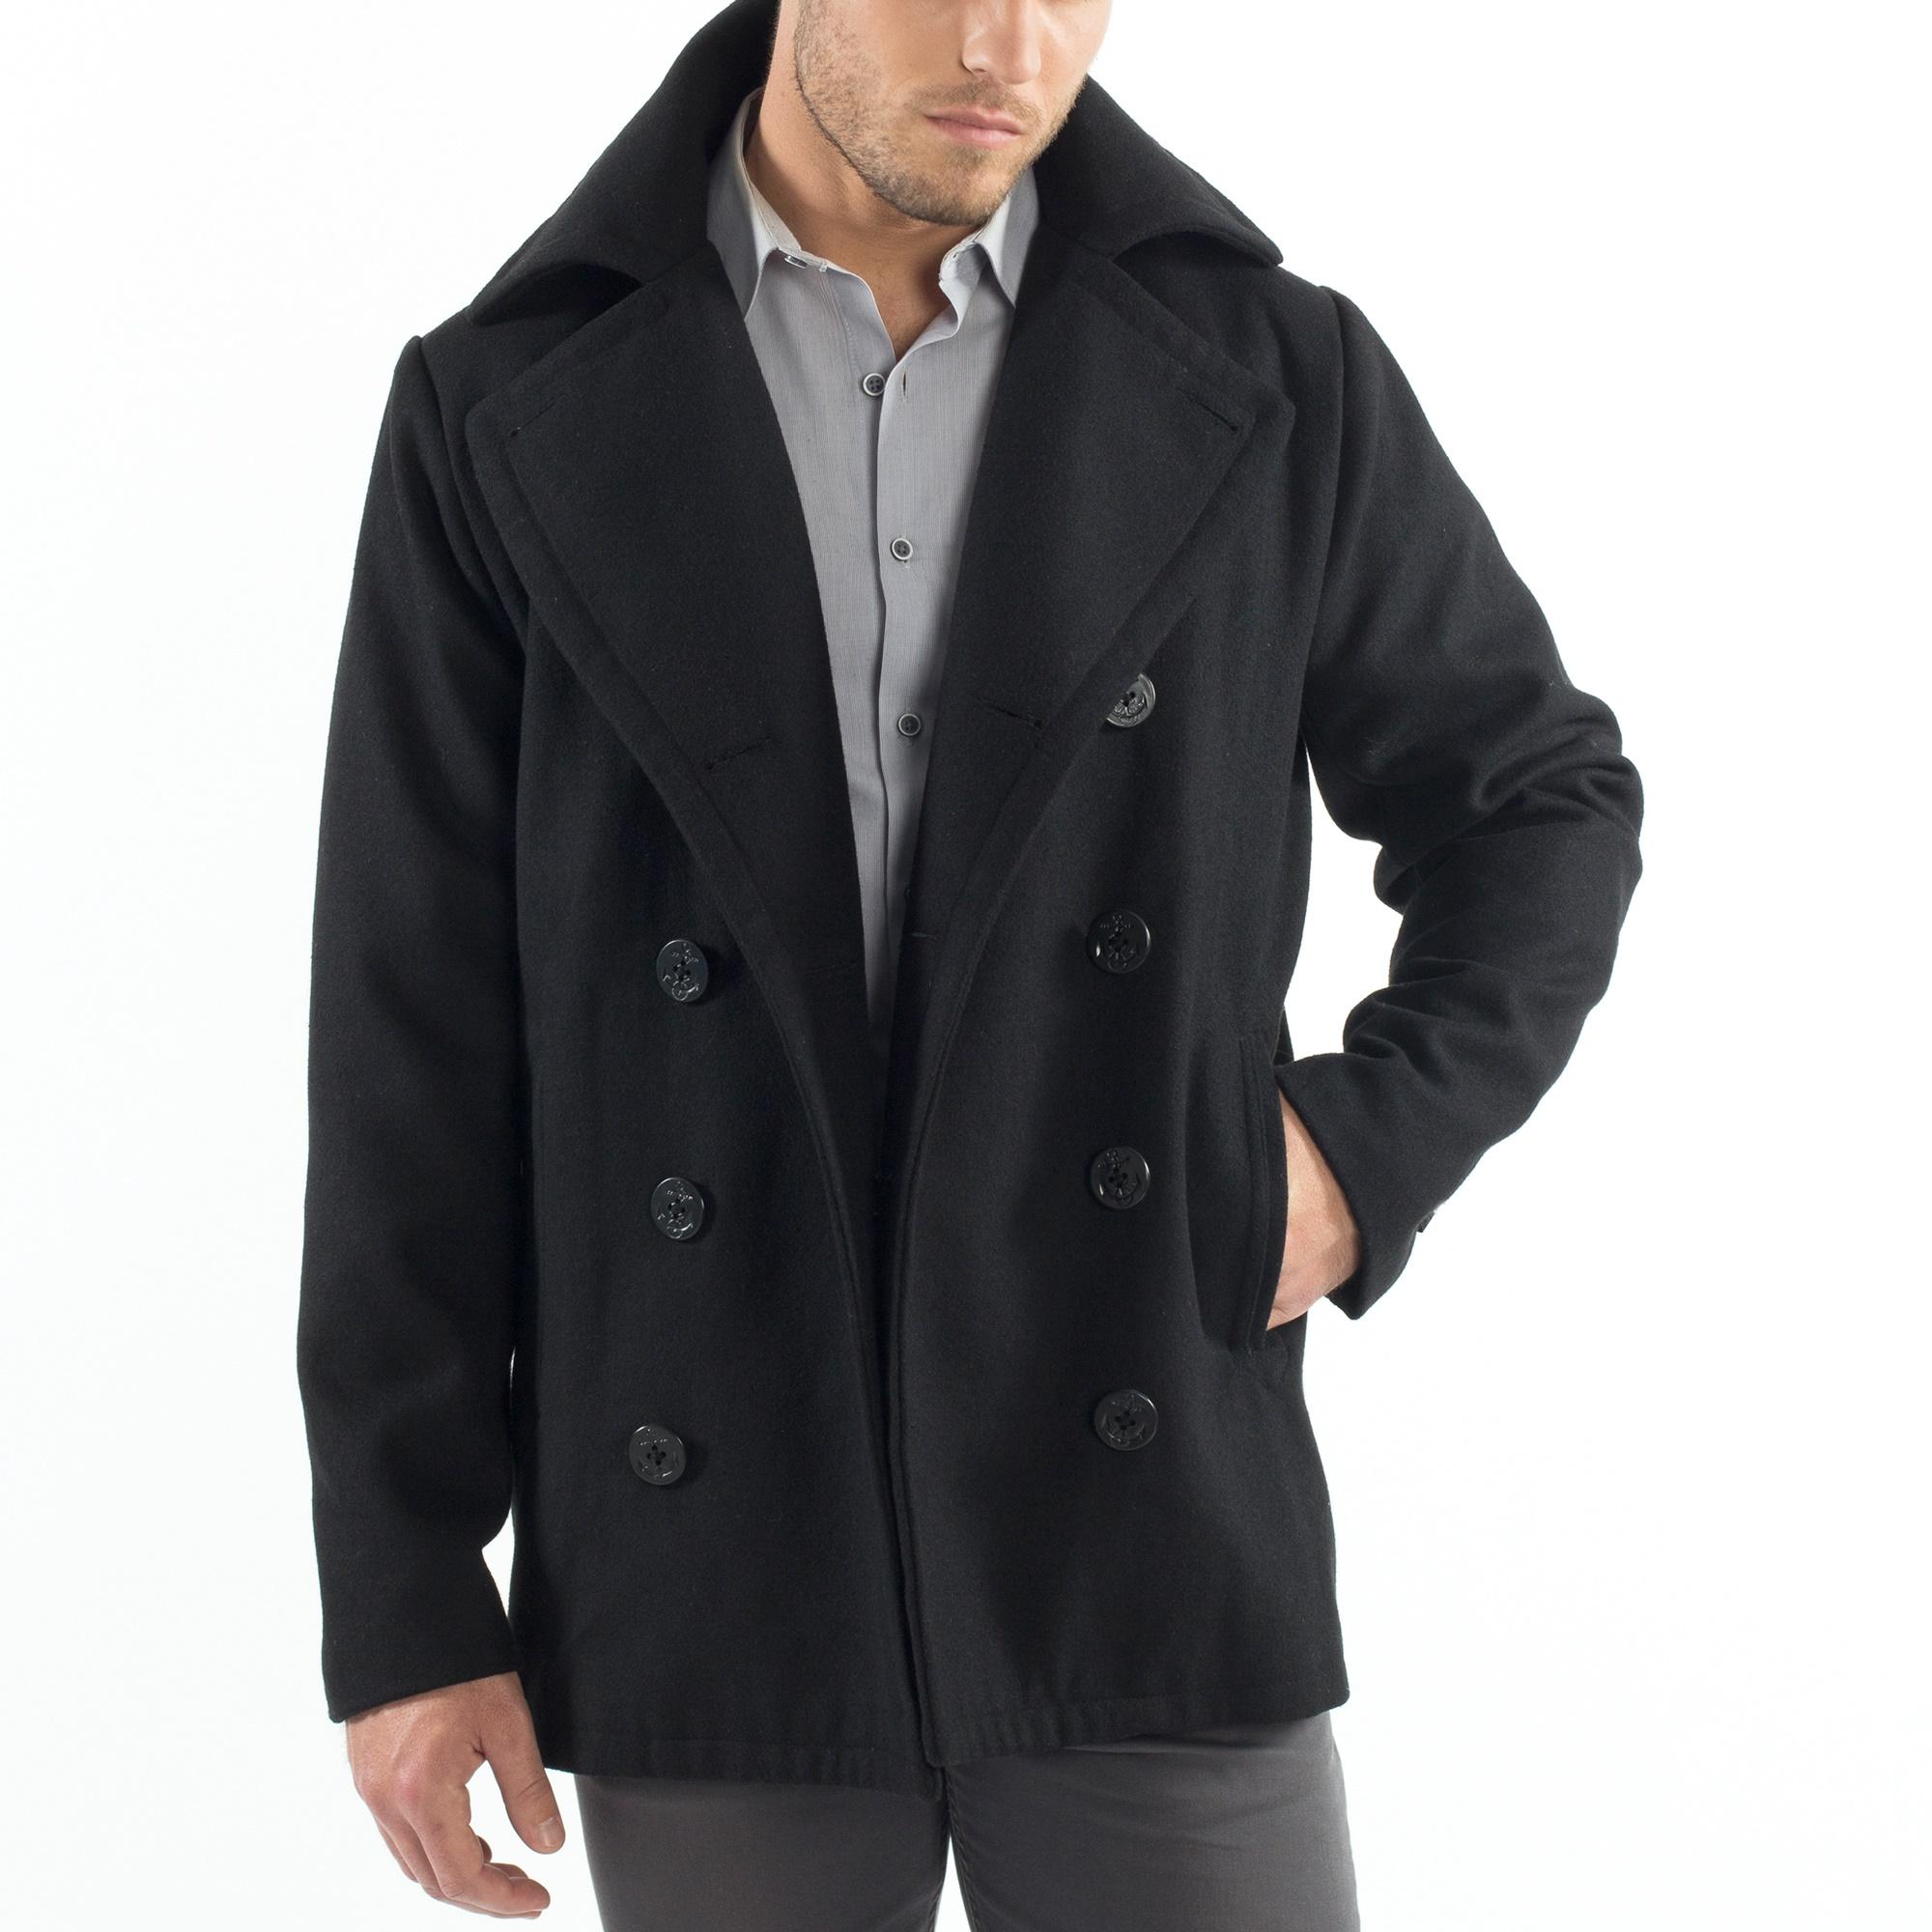 Alpine-Swiss-Mason-Mens-Wool-Blend-Pea-Coat-Jacket-Double-Breasted-Dress-Coat thumbnail 20